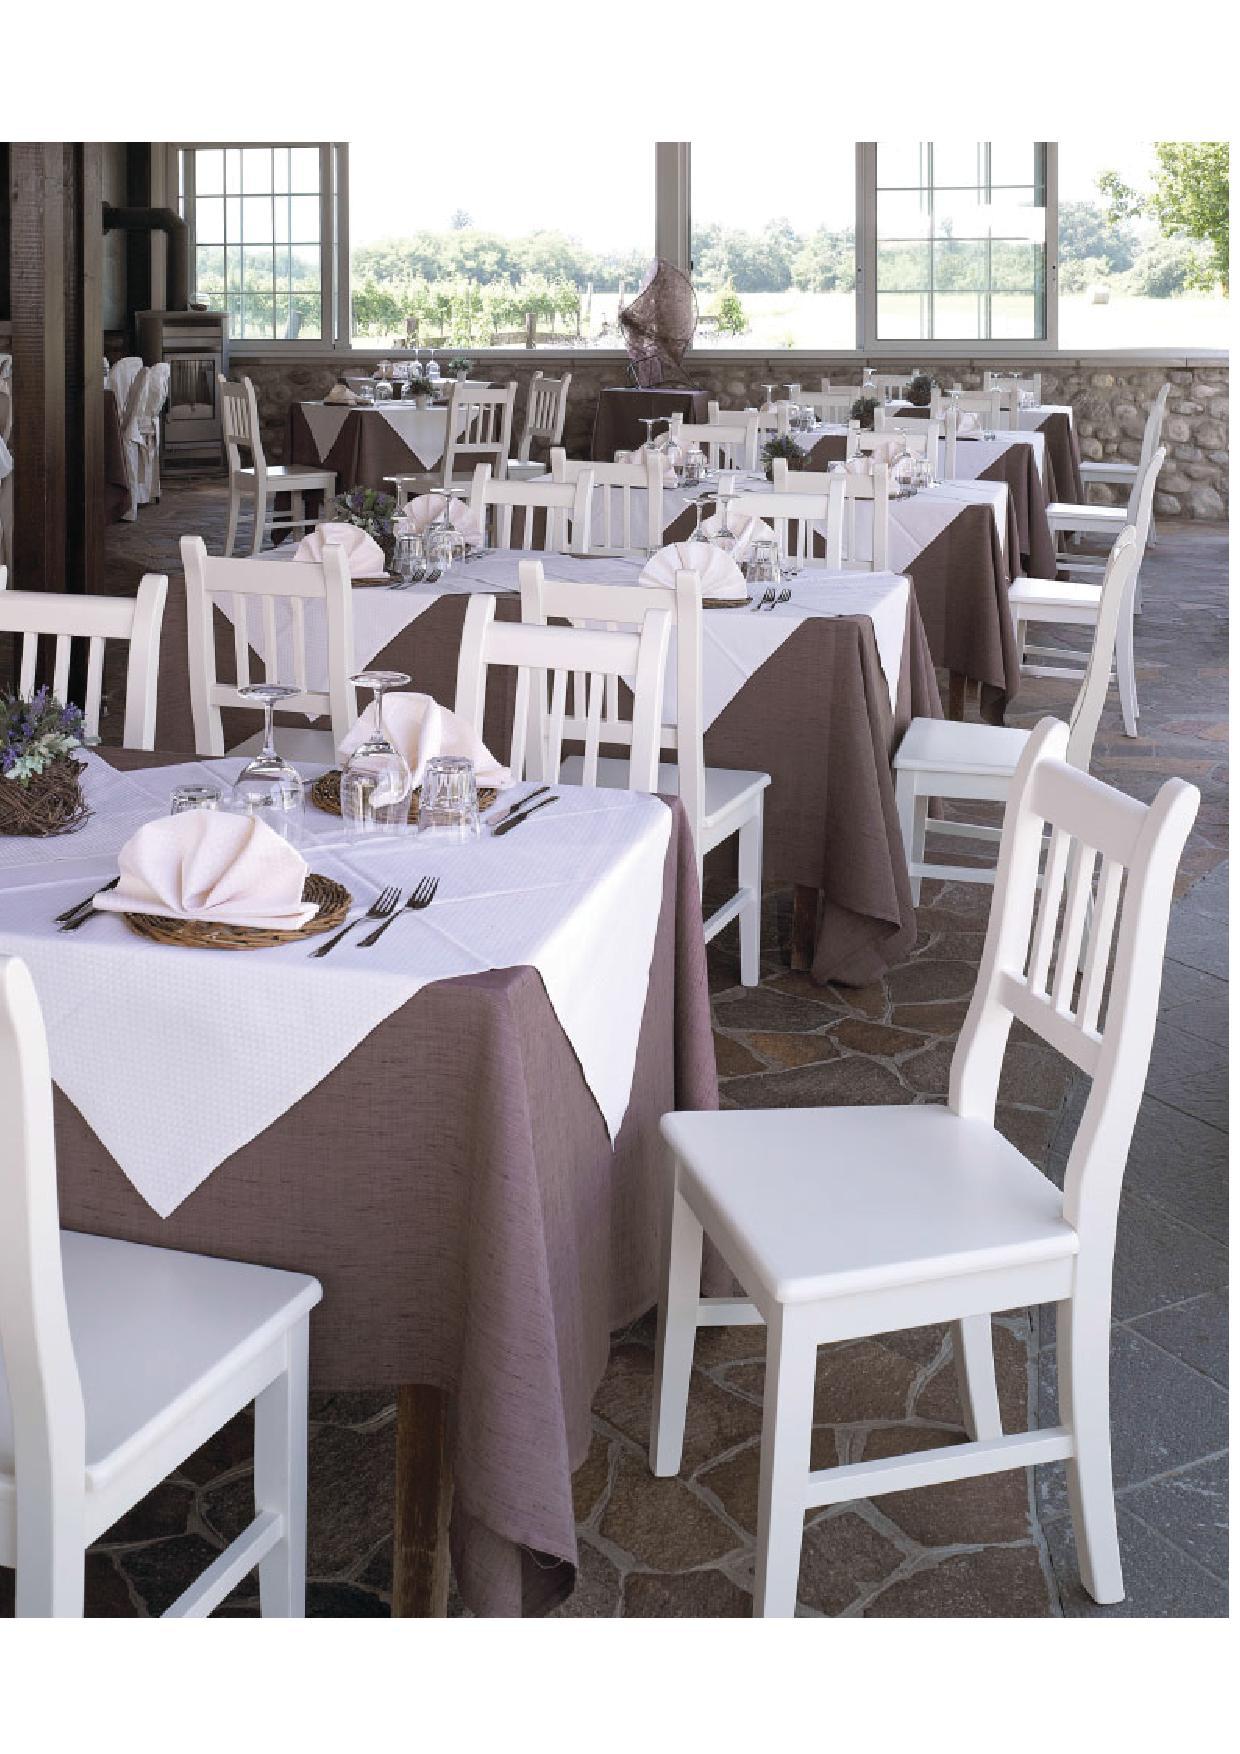 Restaurant-Vintage Landhausstuhl Lisa Buchenholz